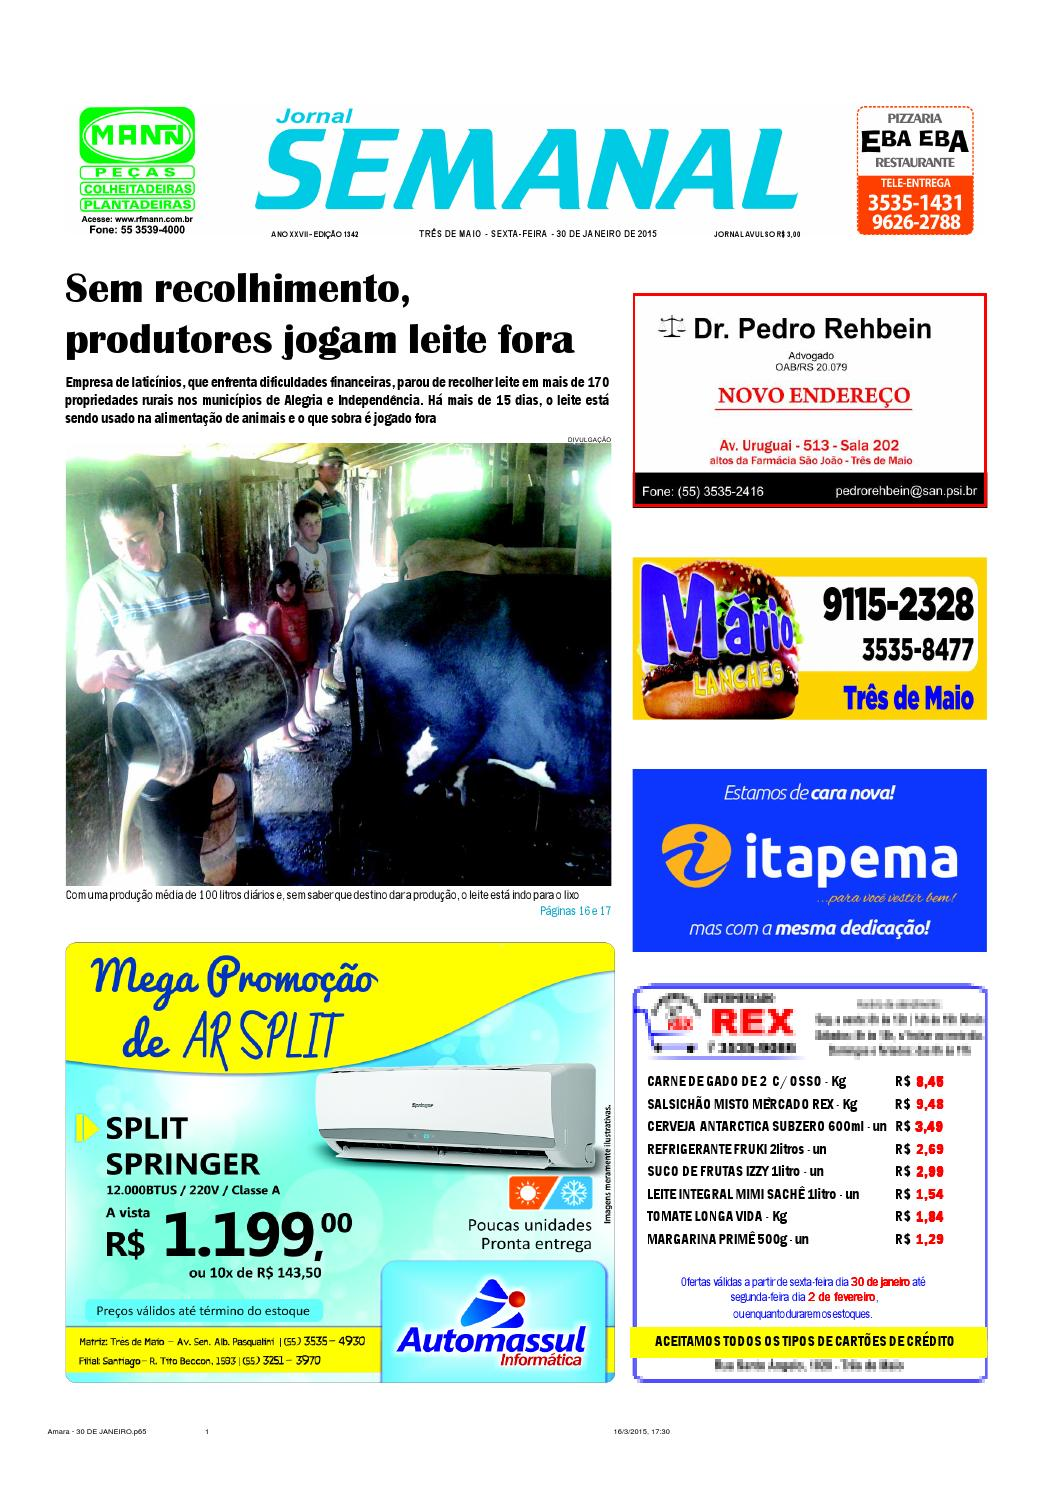 Jornal Semanal Ed 1342 - 30 de janeiro by Semanal Jornal - issuu